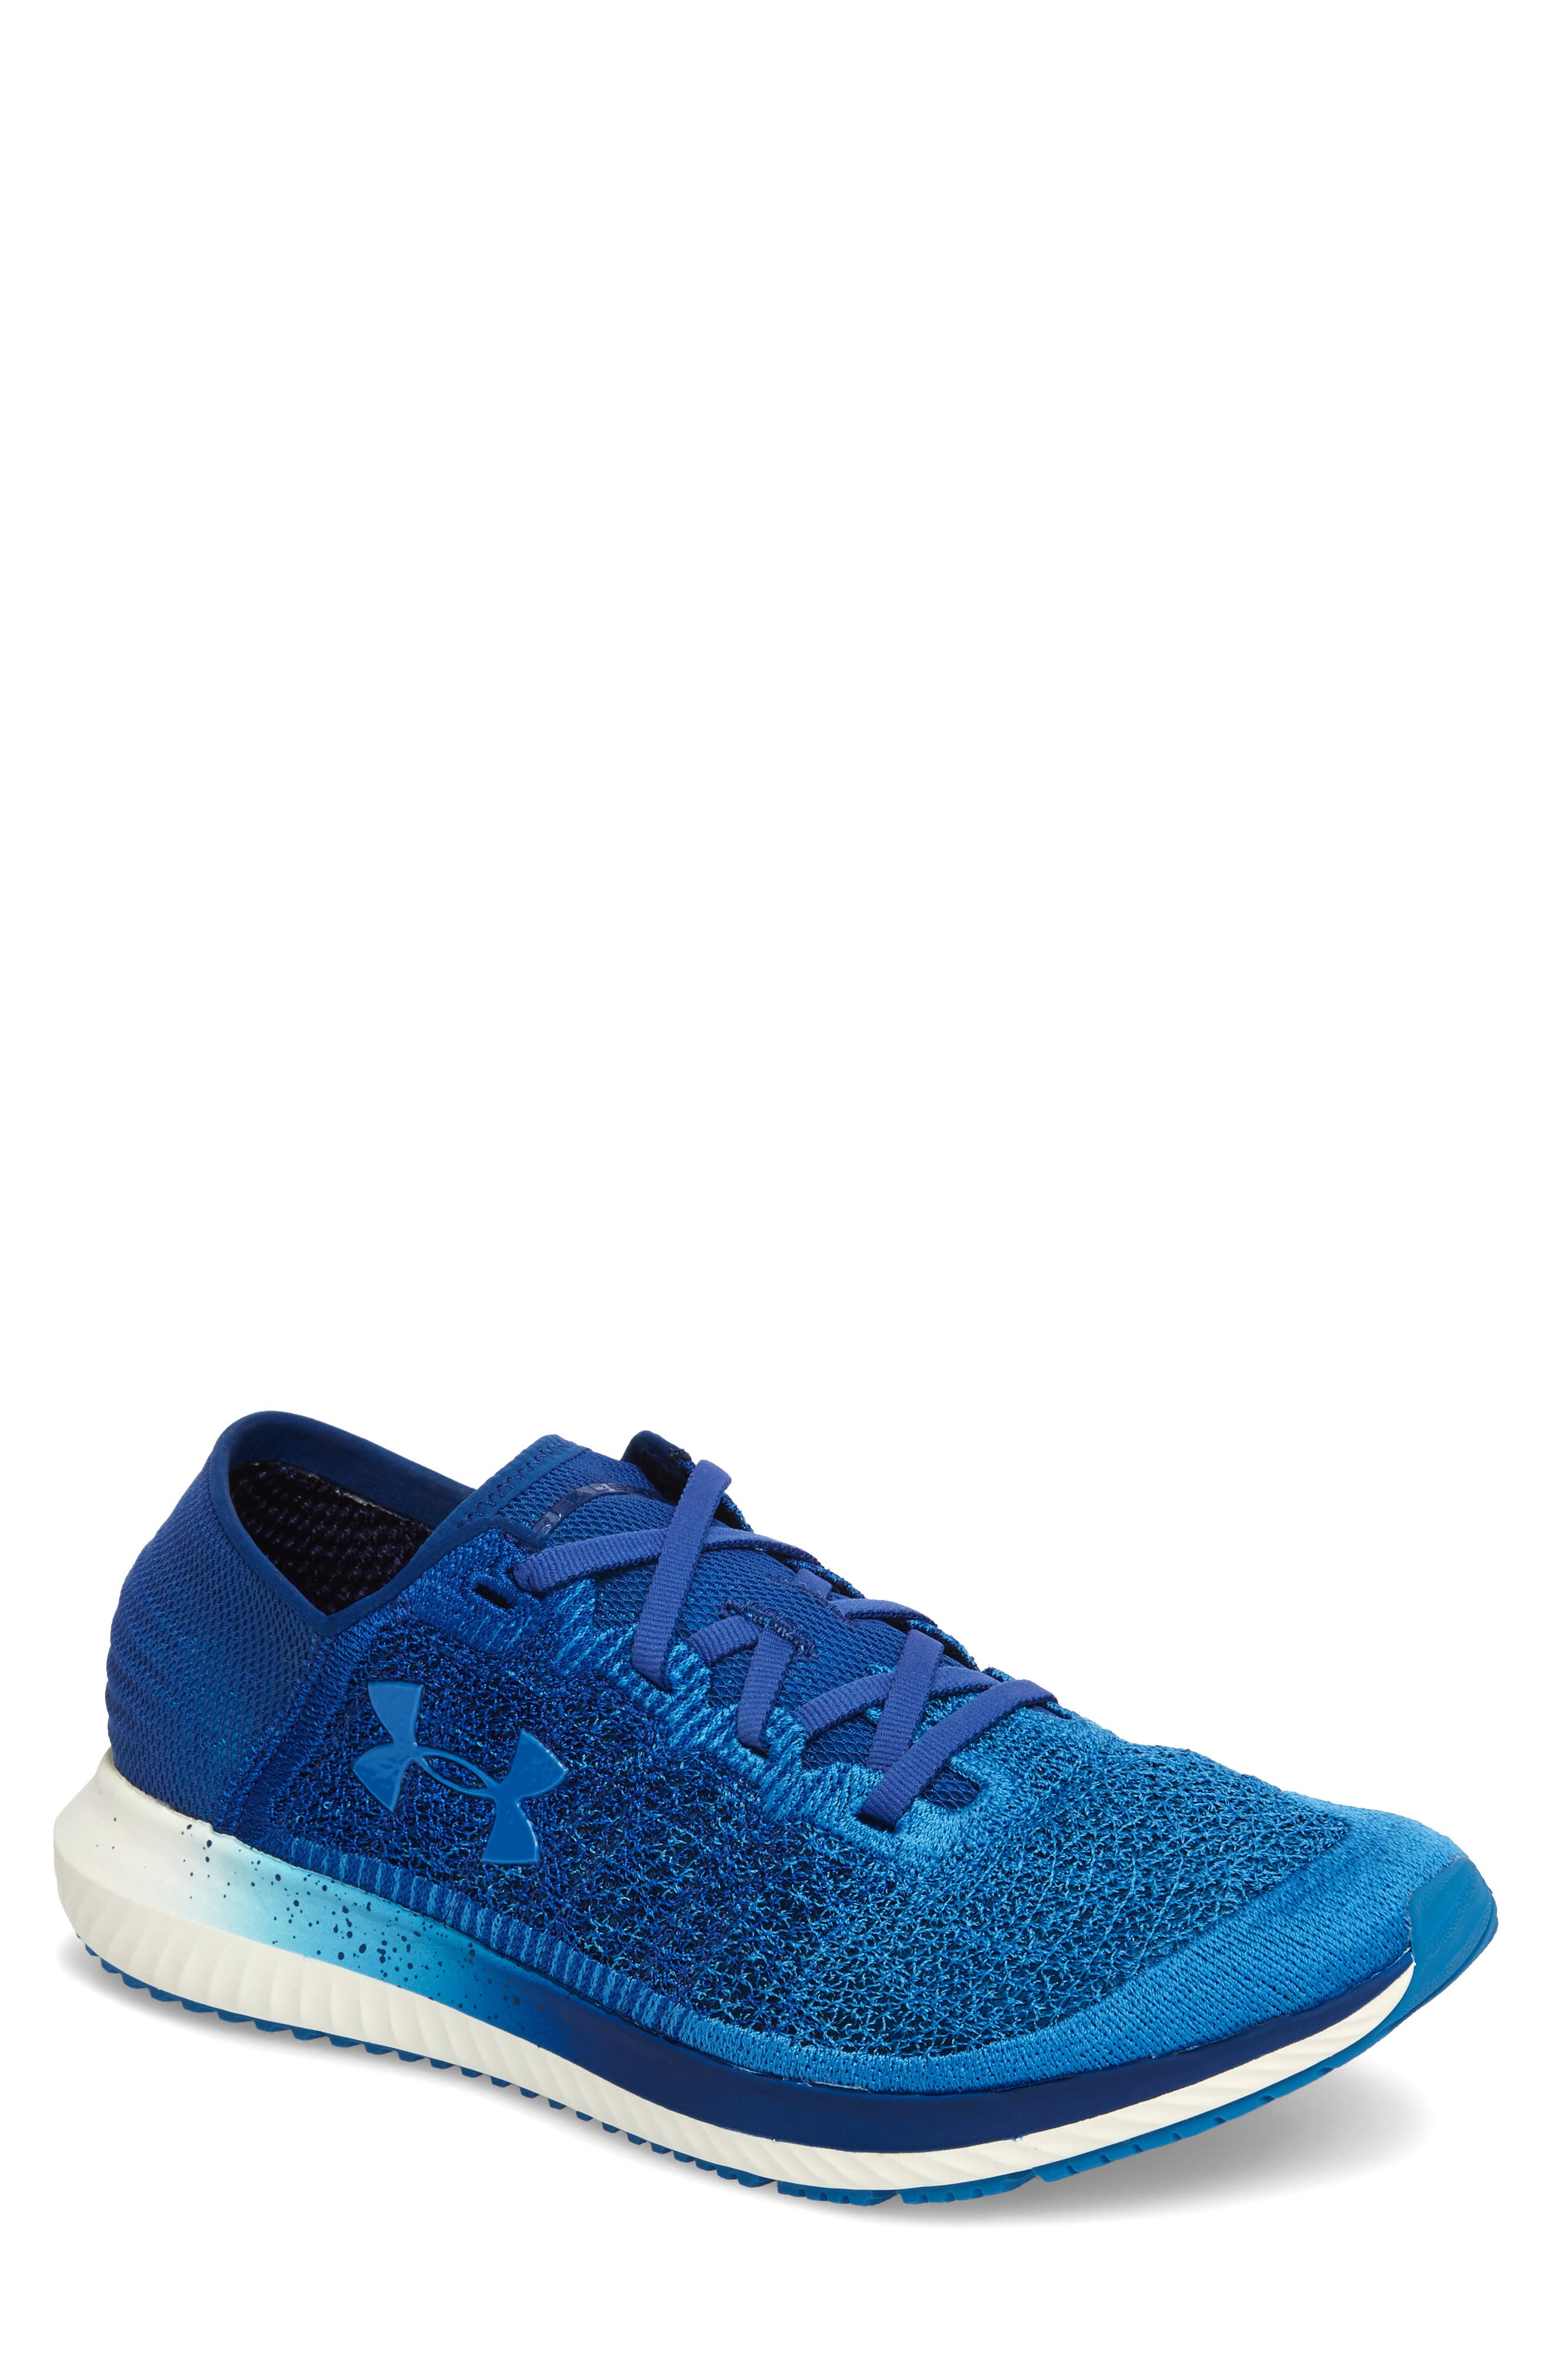 Threadborne Blur Running Shoe,                             Main thumbnail 1, color,                             BLUE / STUDIO